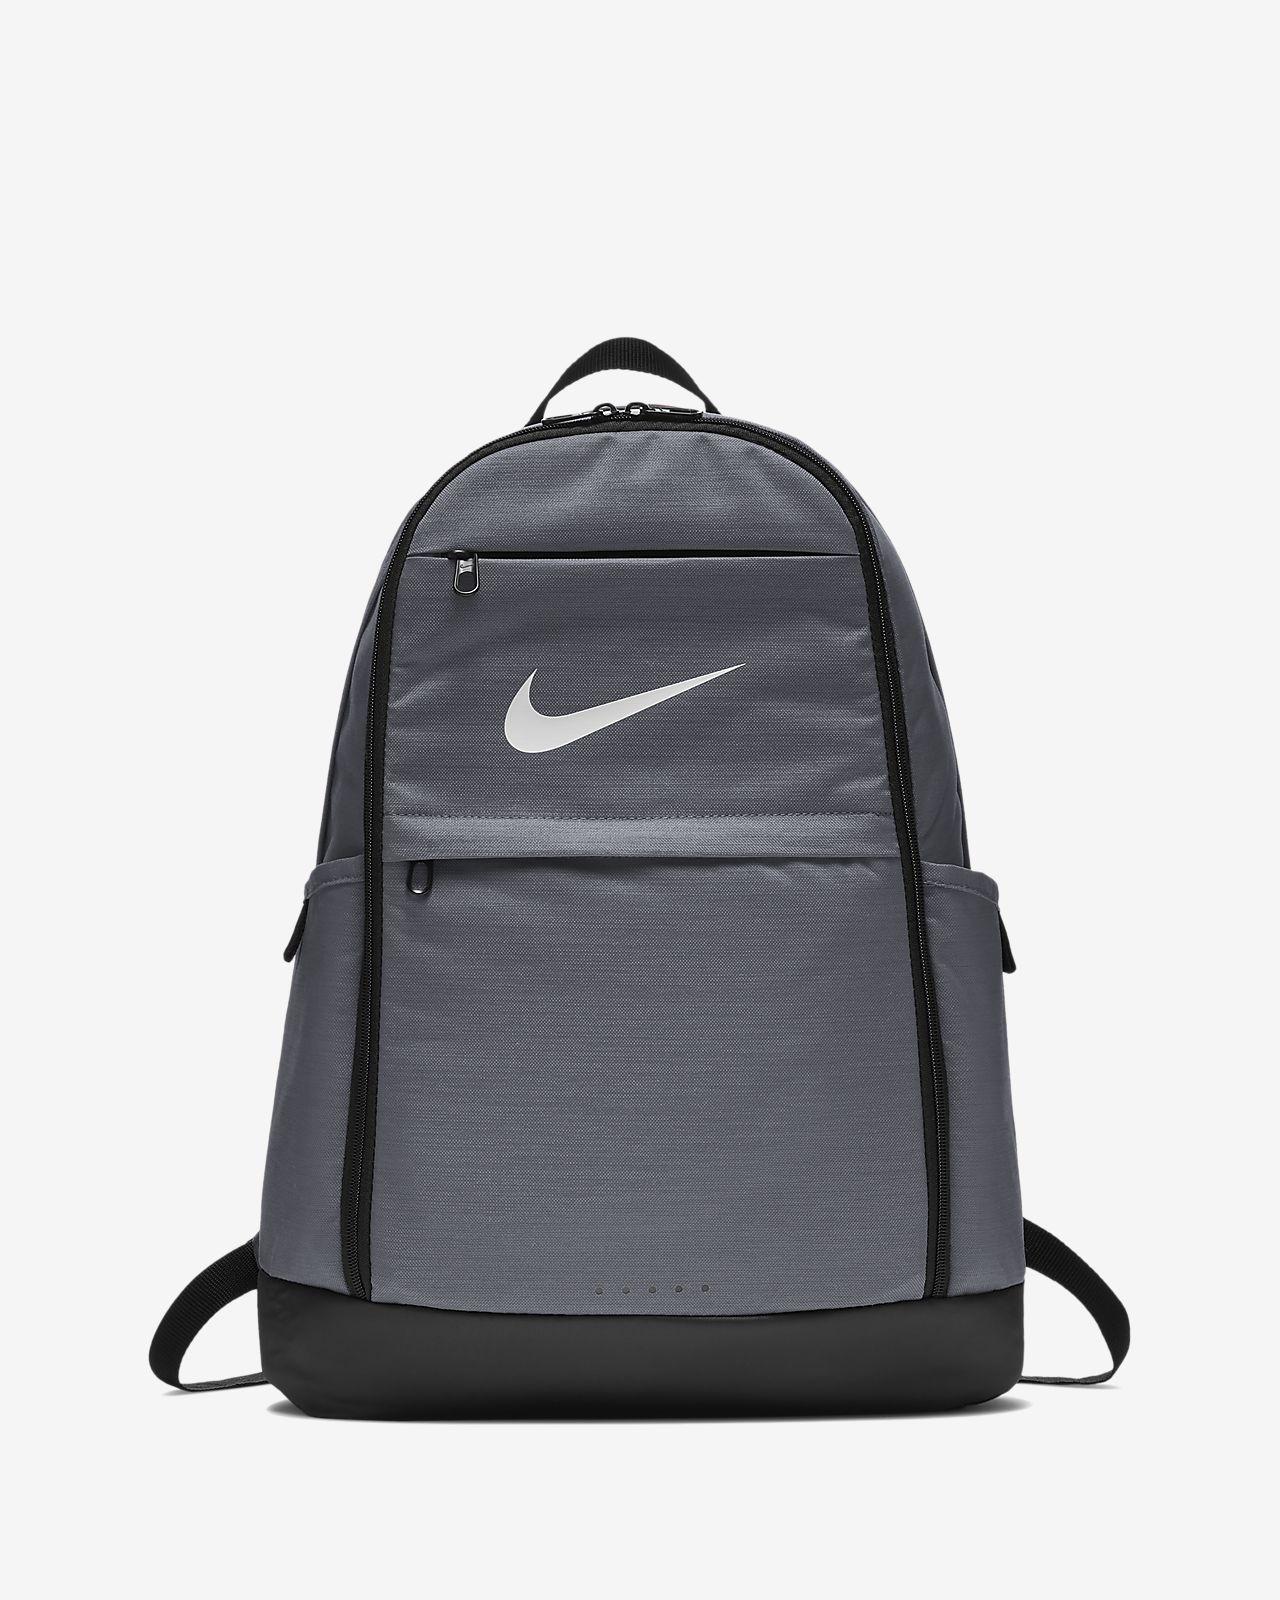 cbb48dd7f1407 Plecak treningowy Nike Brasilia (rozmiar XL). Nike.com PL